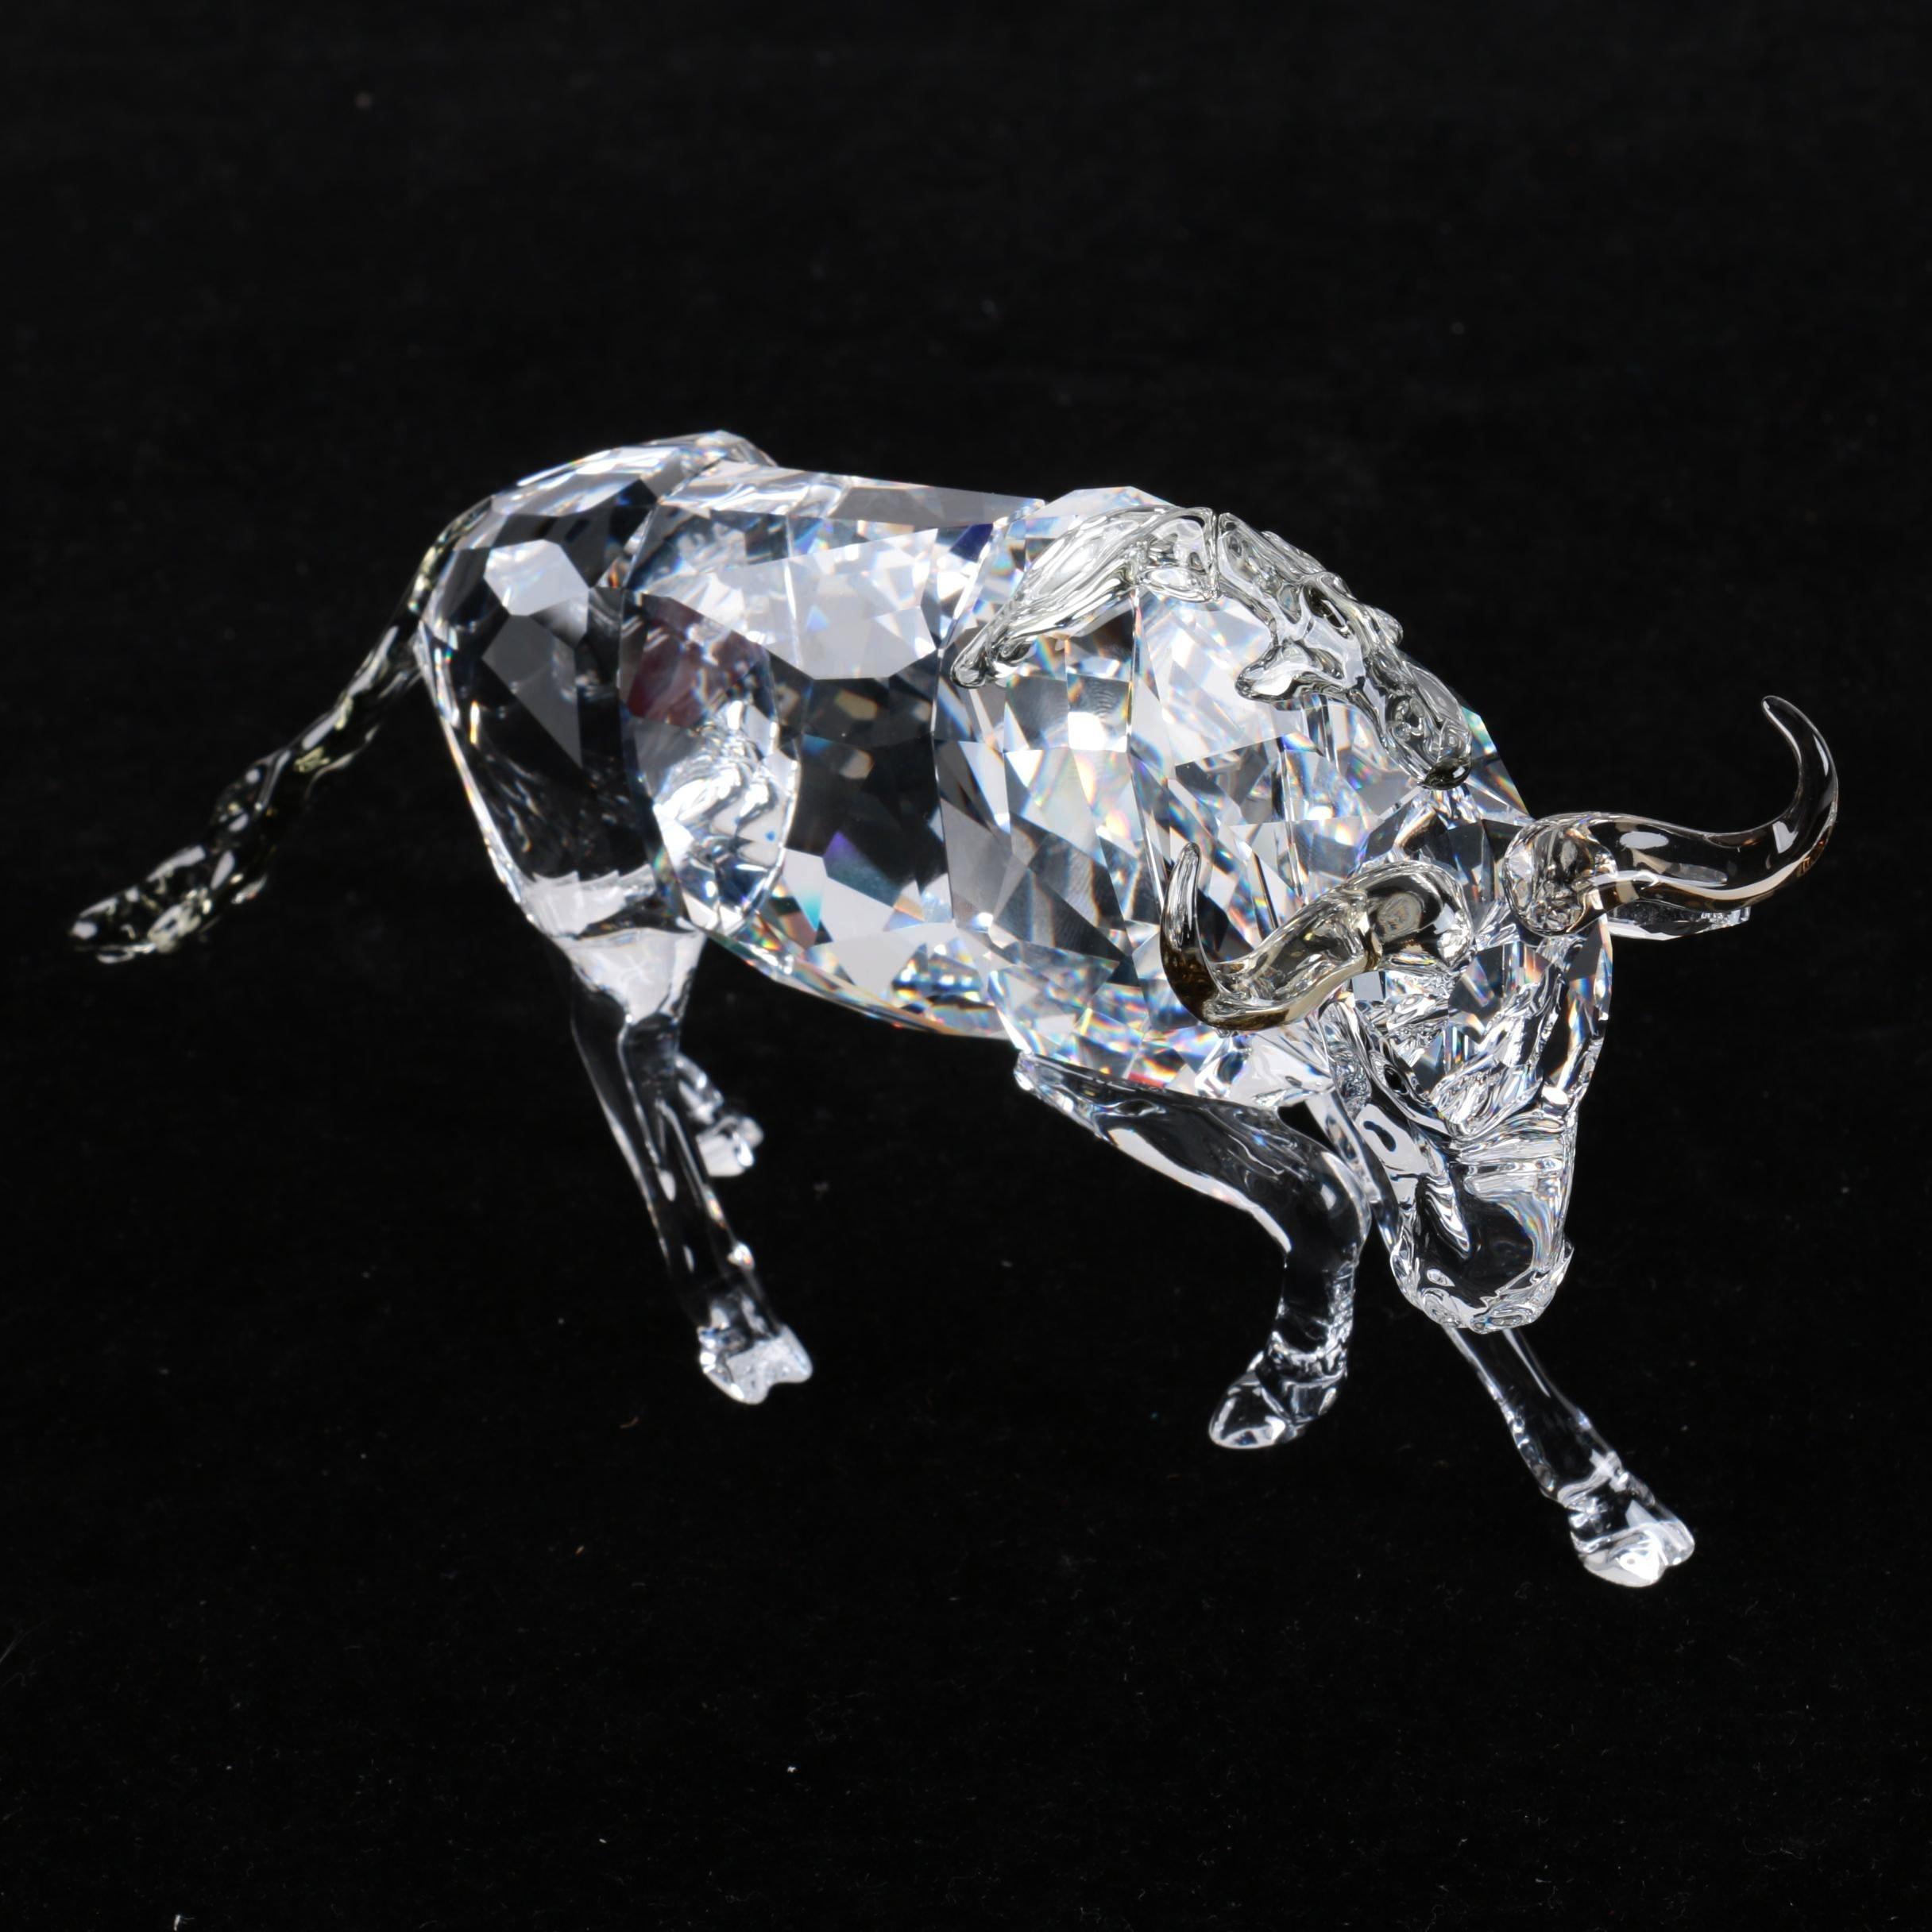 Swarovski Gnu Wildebeest Crystal Figurine with Box